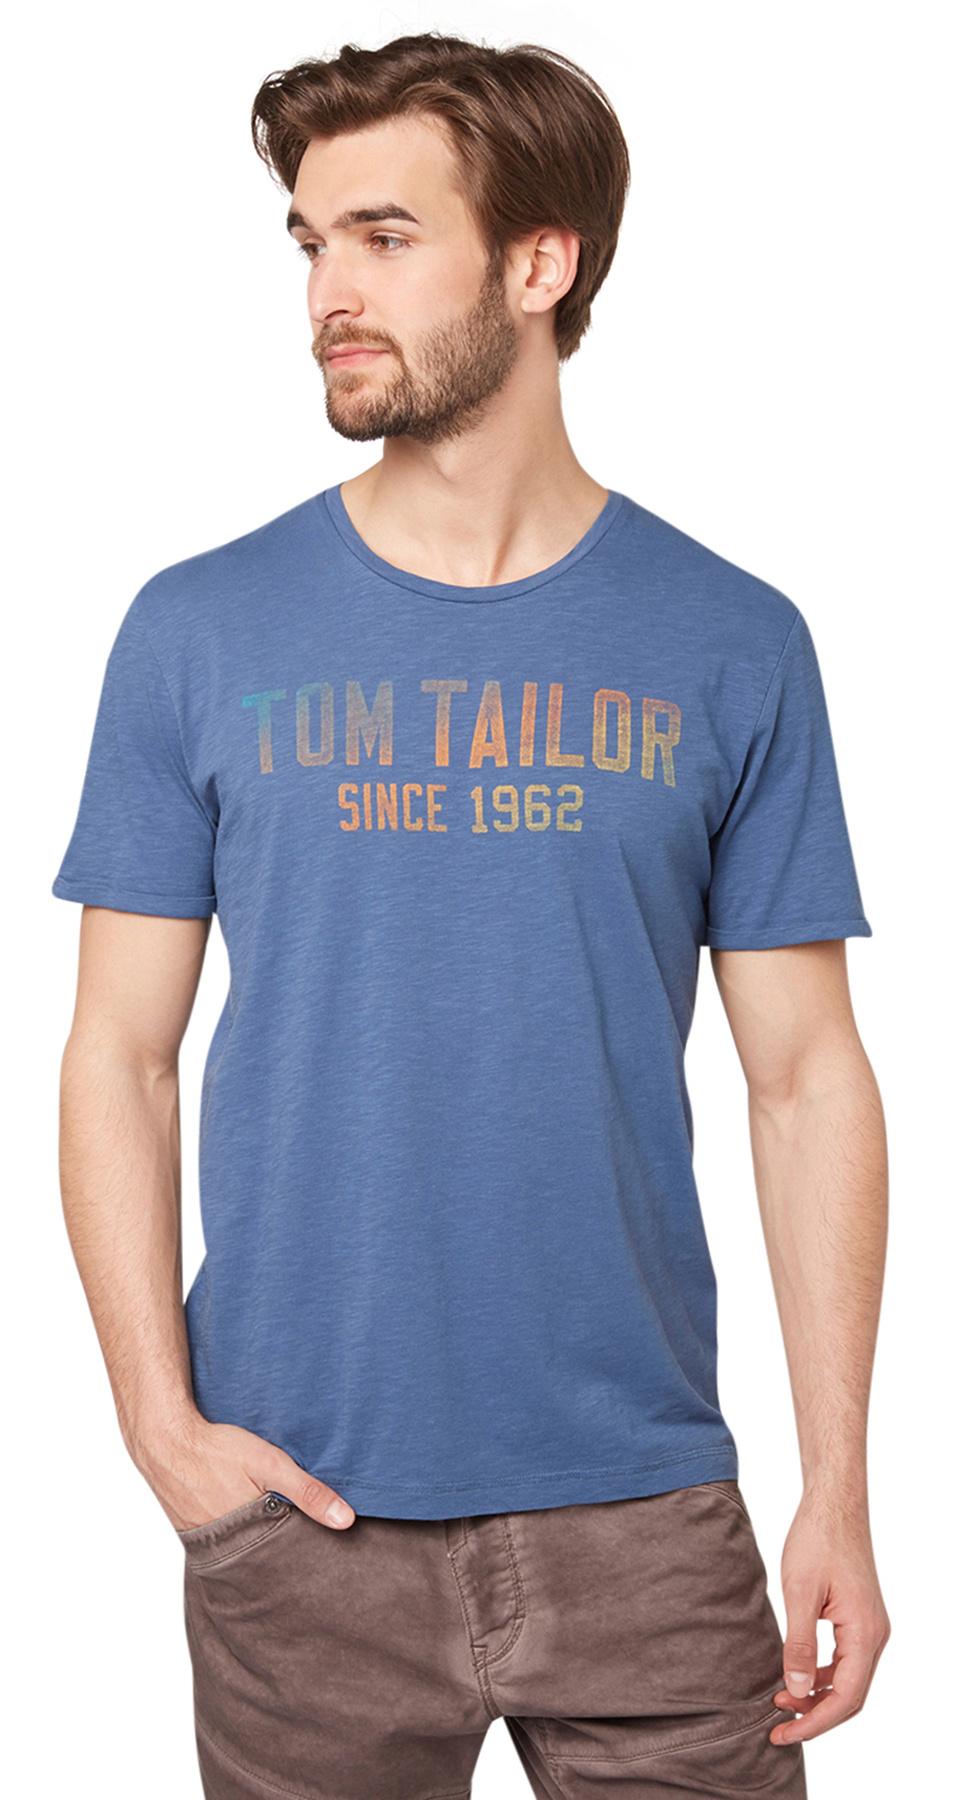 Tom Tailor pánské triko 10350006210/6865 Modrá XL